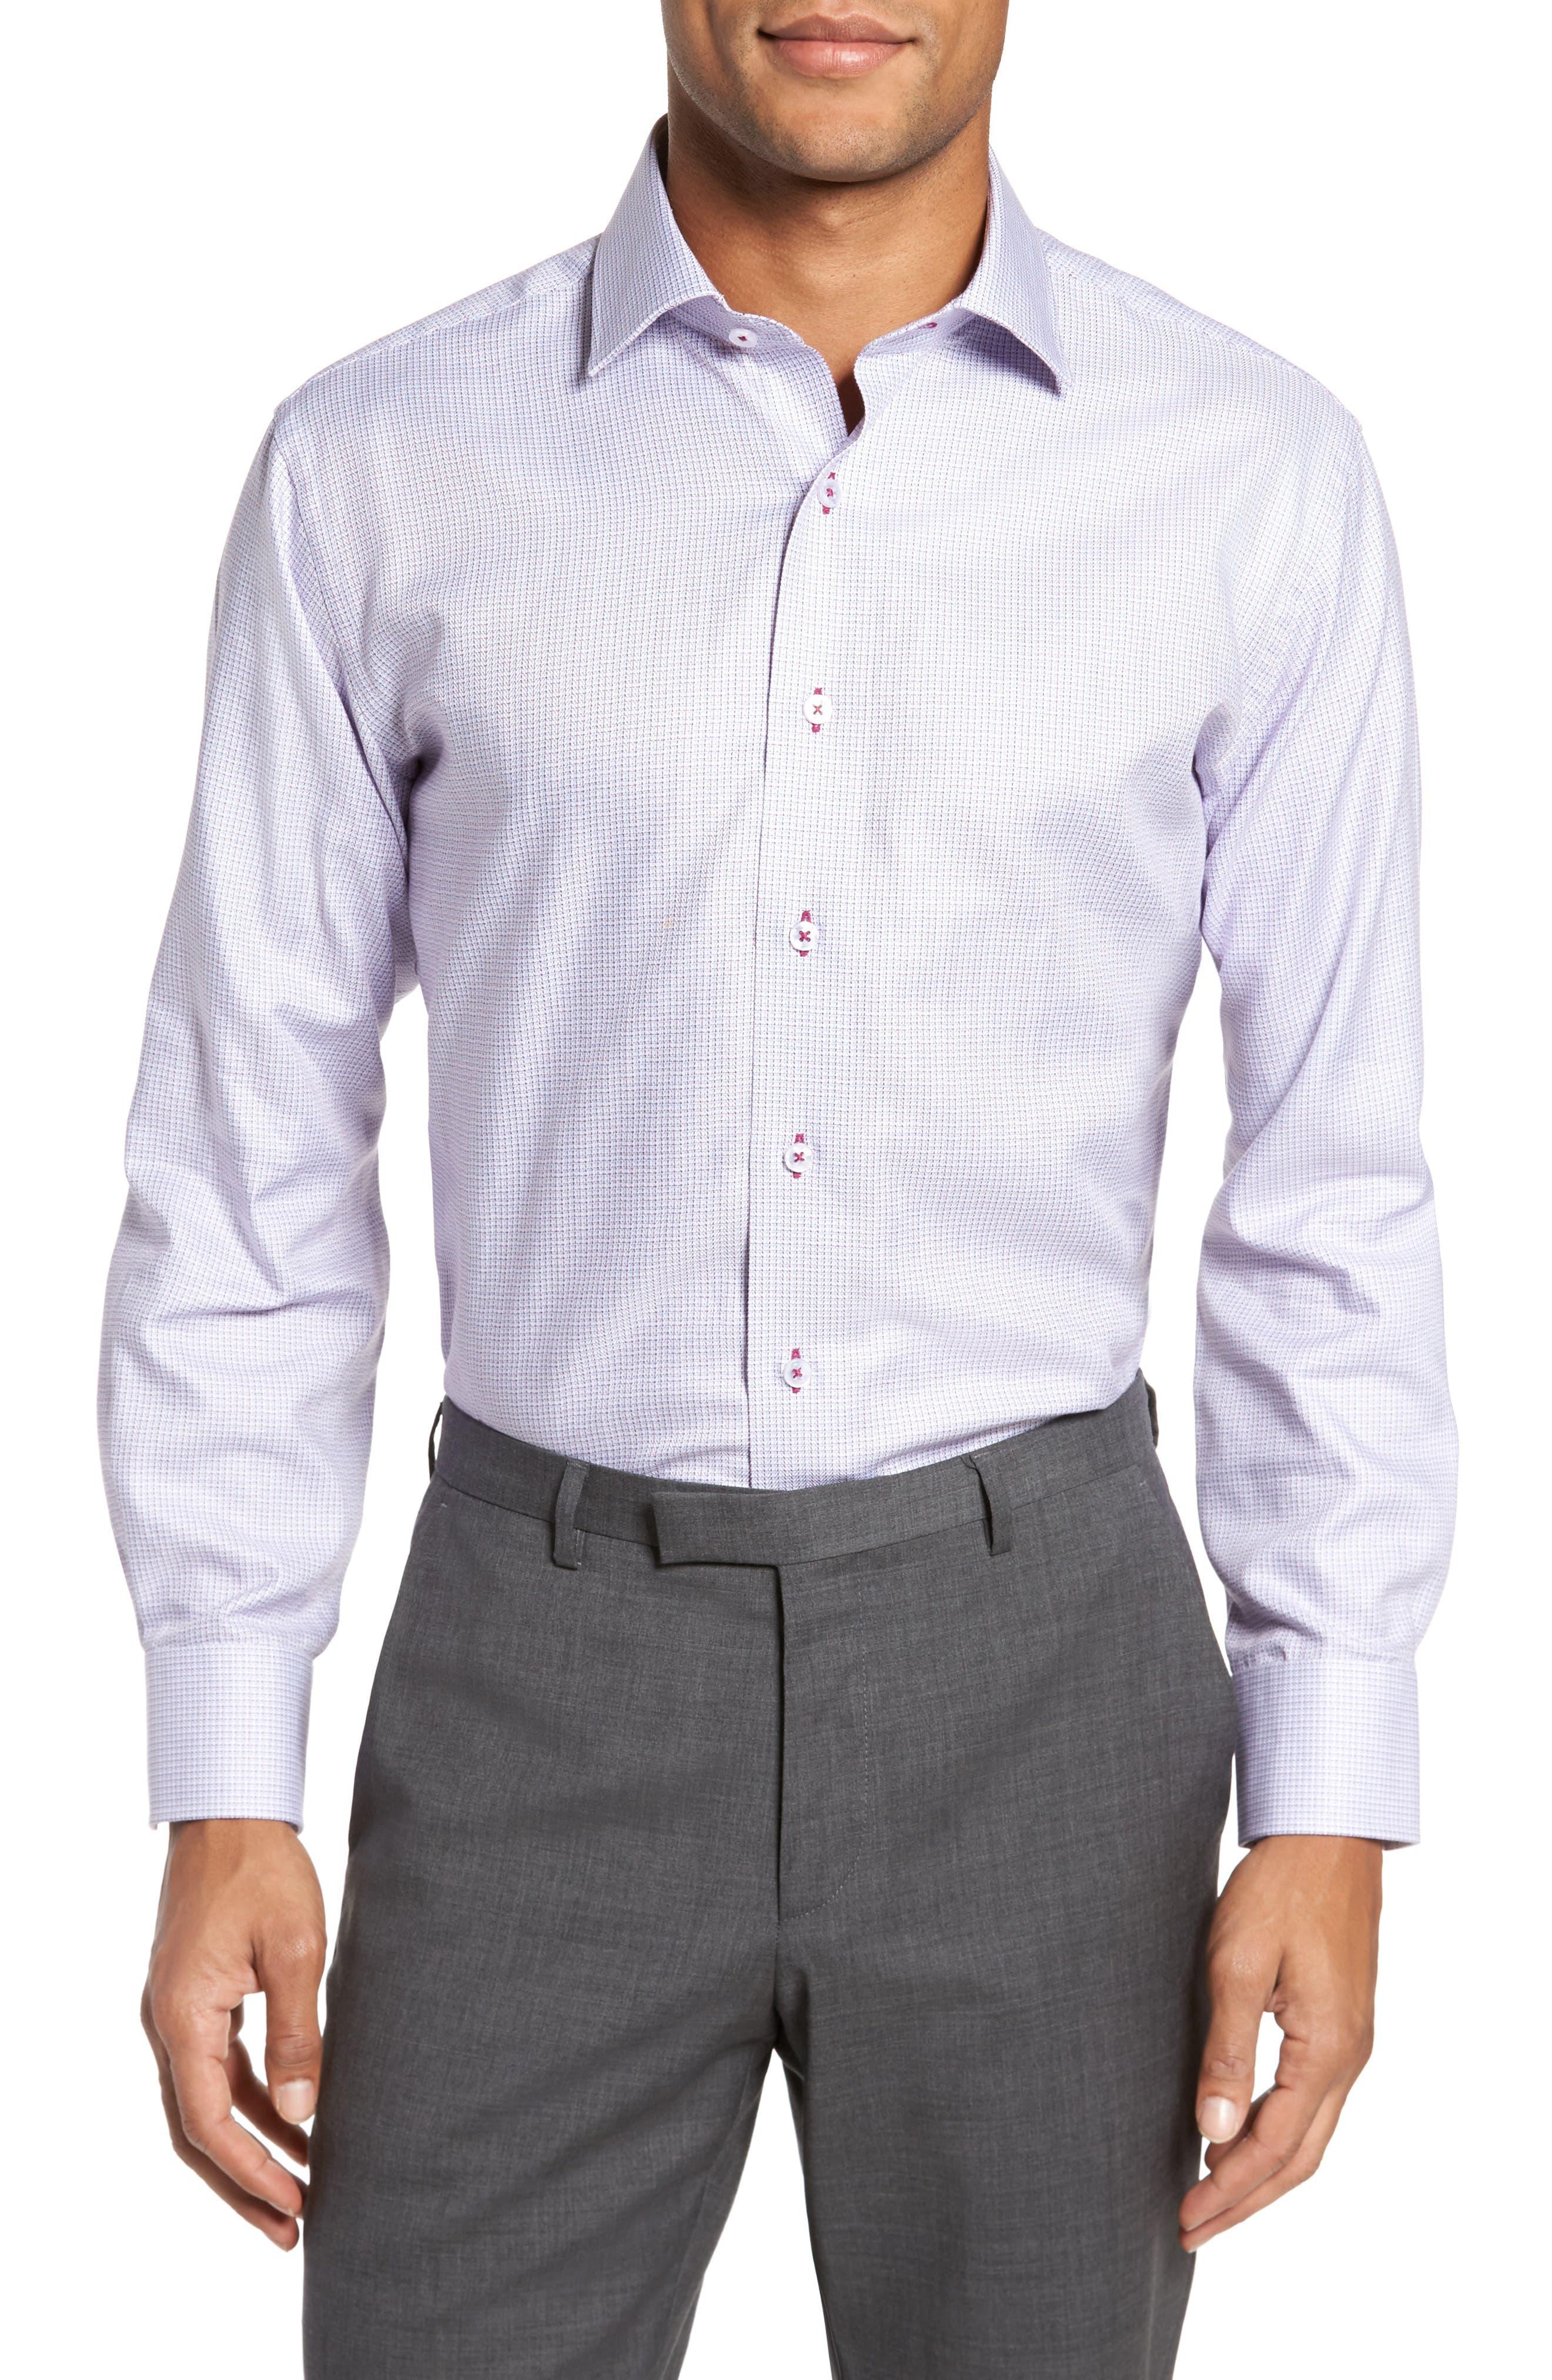 Alternate Image 2  - Lorenzo Uomo Trim Fit Textured Check Dress Shirt